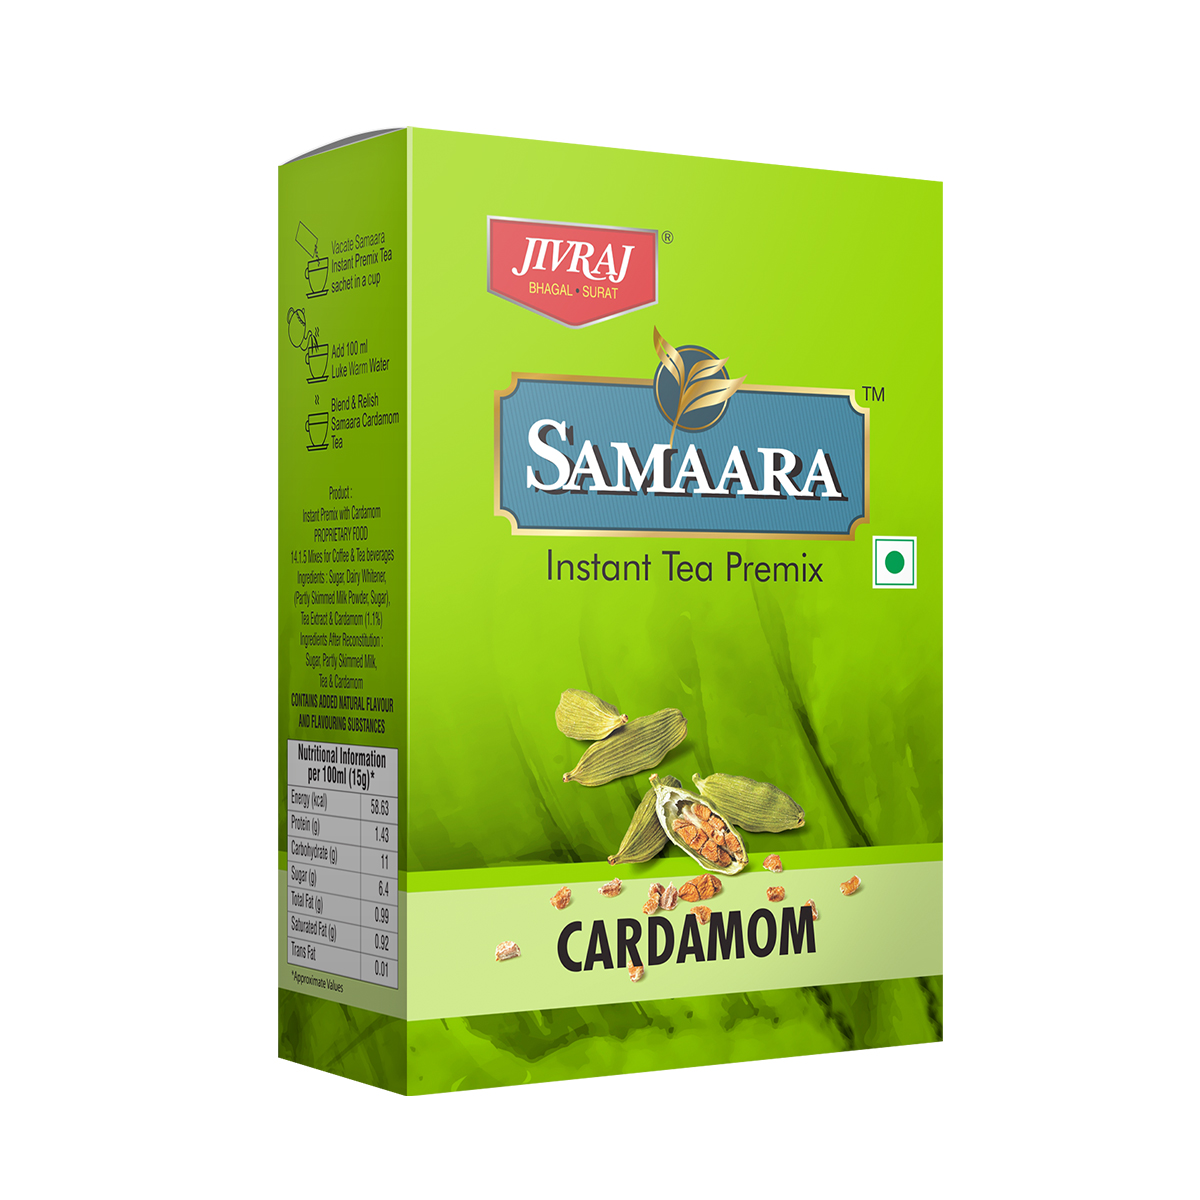 Samaara-Instant-Tea-Premix-Cardamom